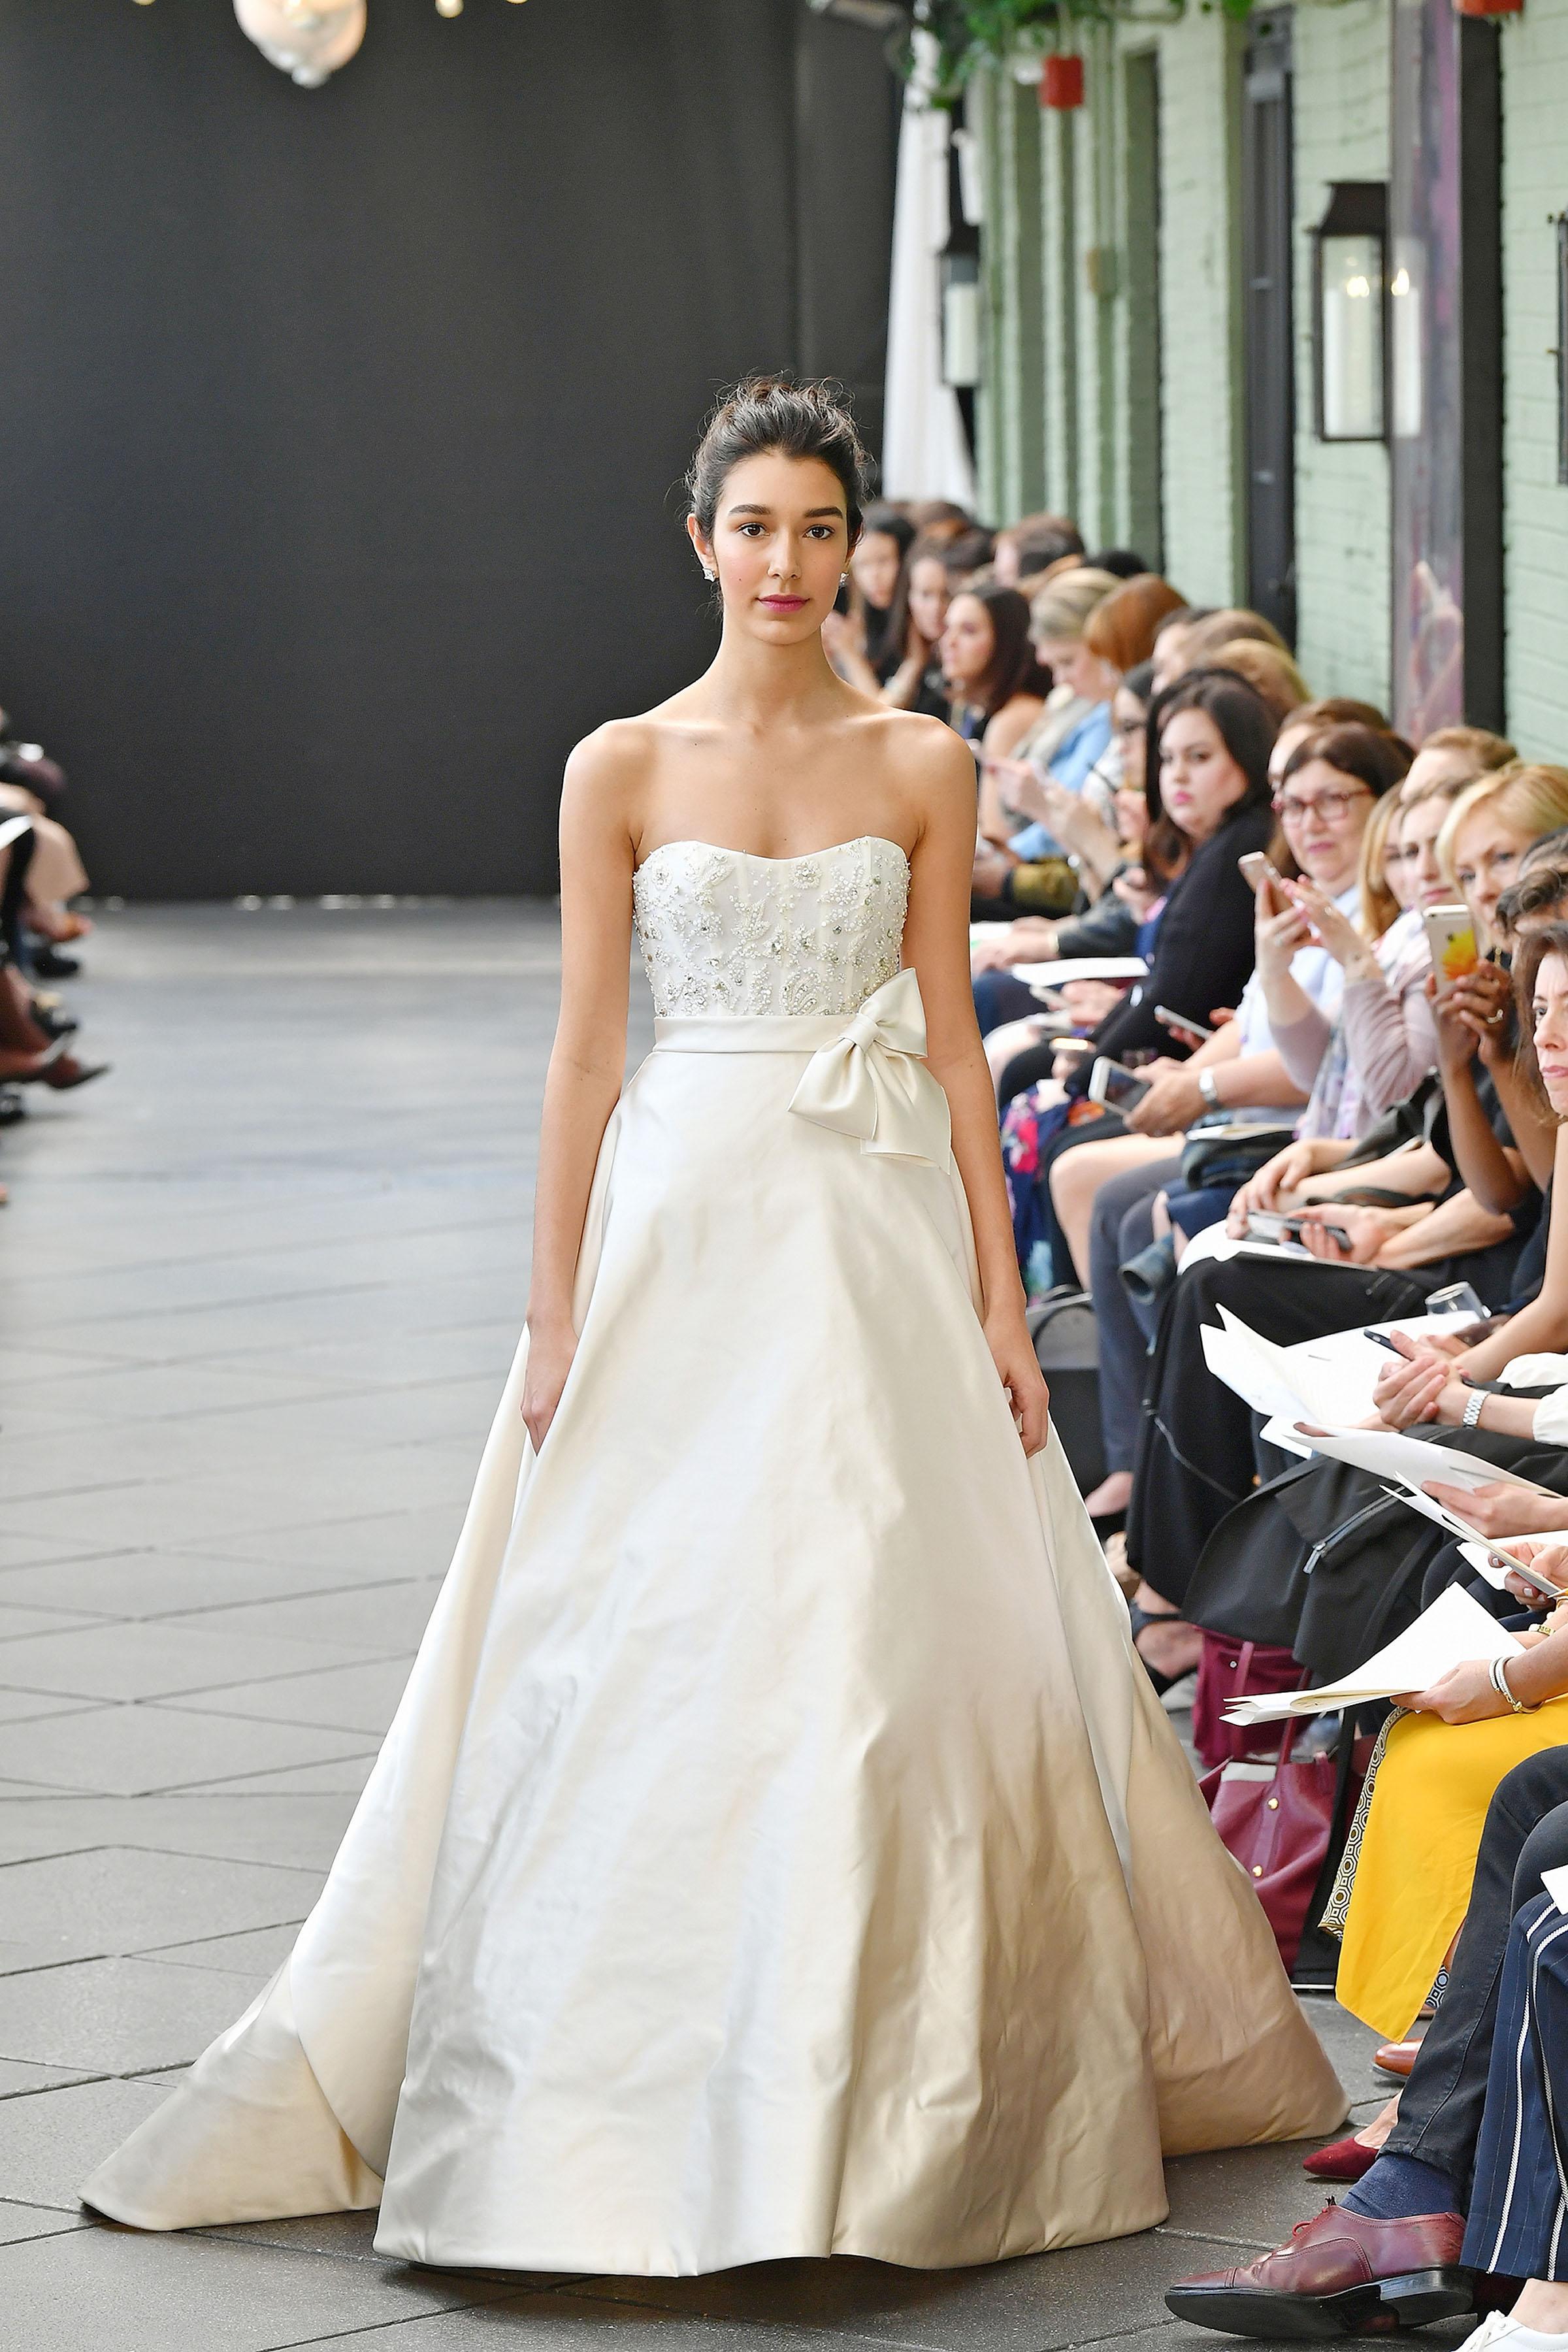 nouvelle amsale wedding dress spring 2019 strapless with bow on belt